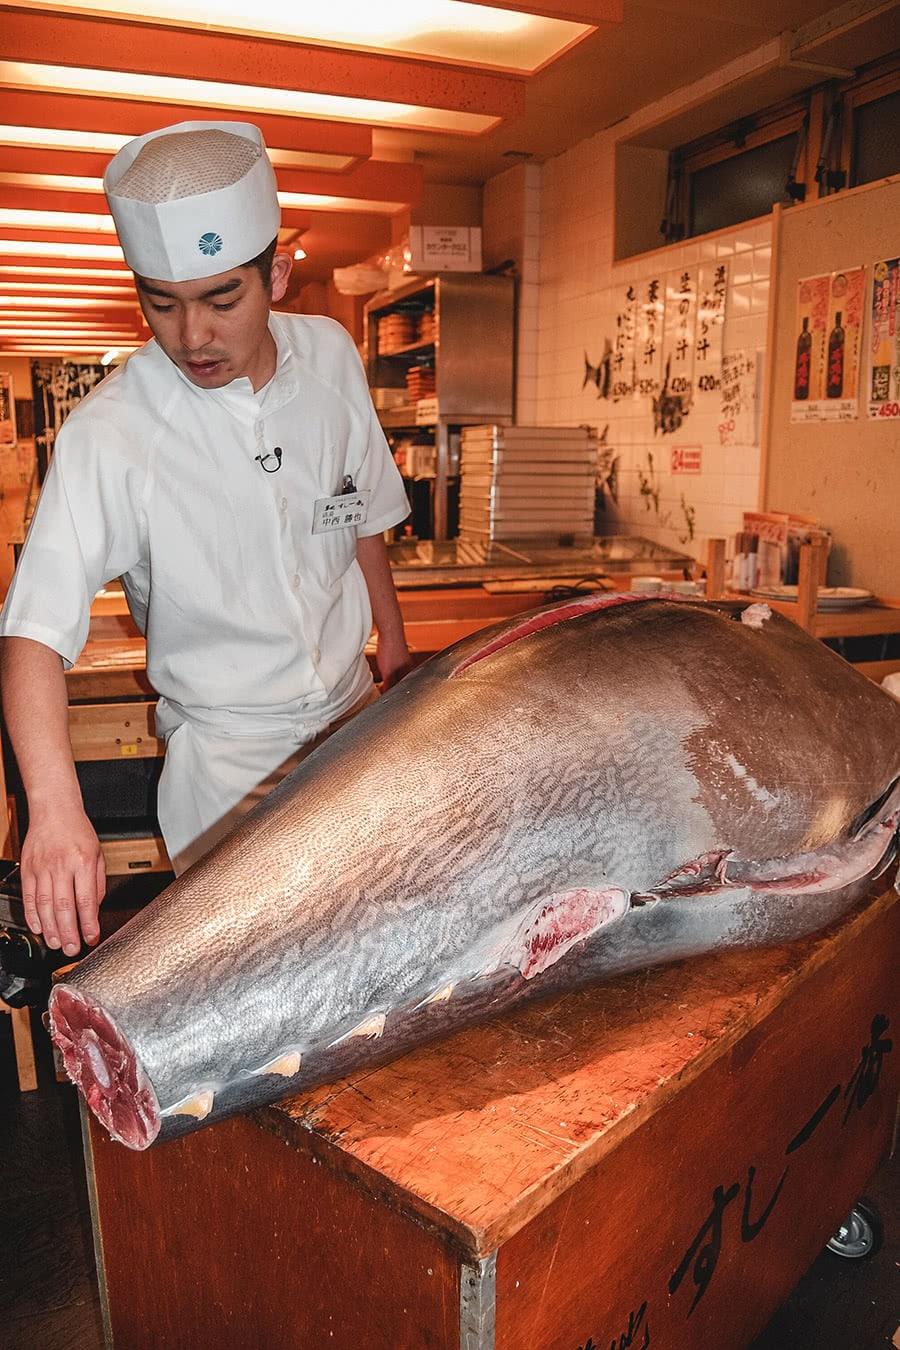 Tuna auction at Tsukiji market in Tokyo.